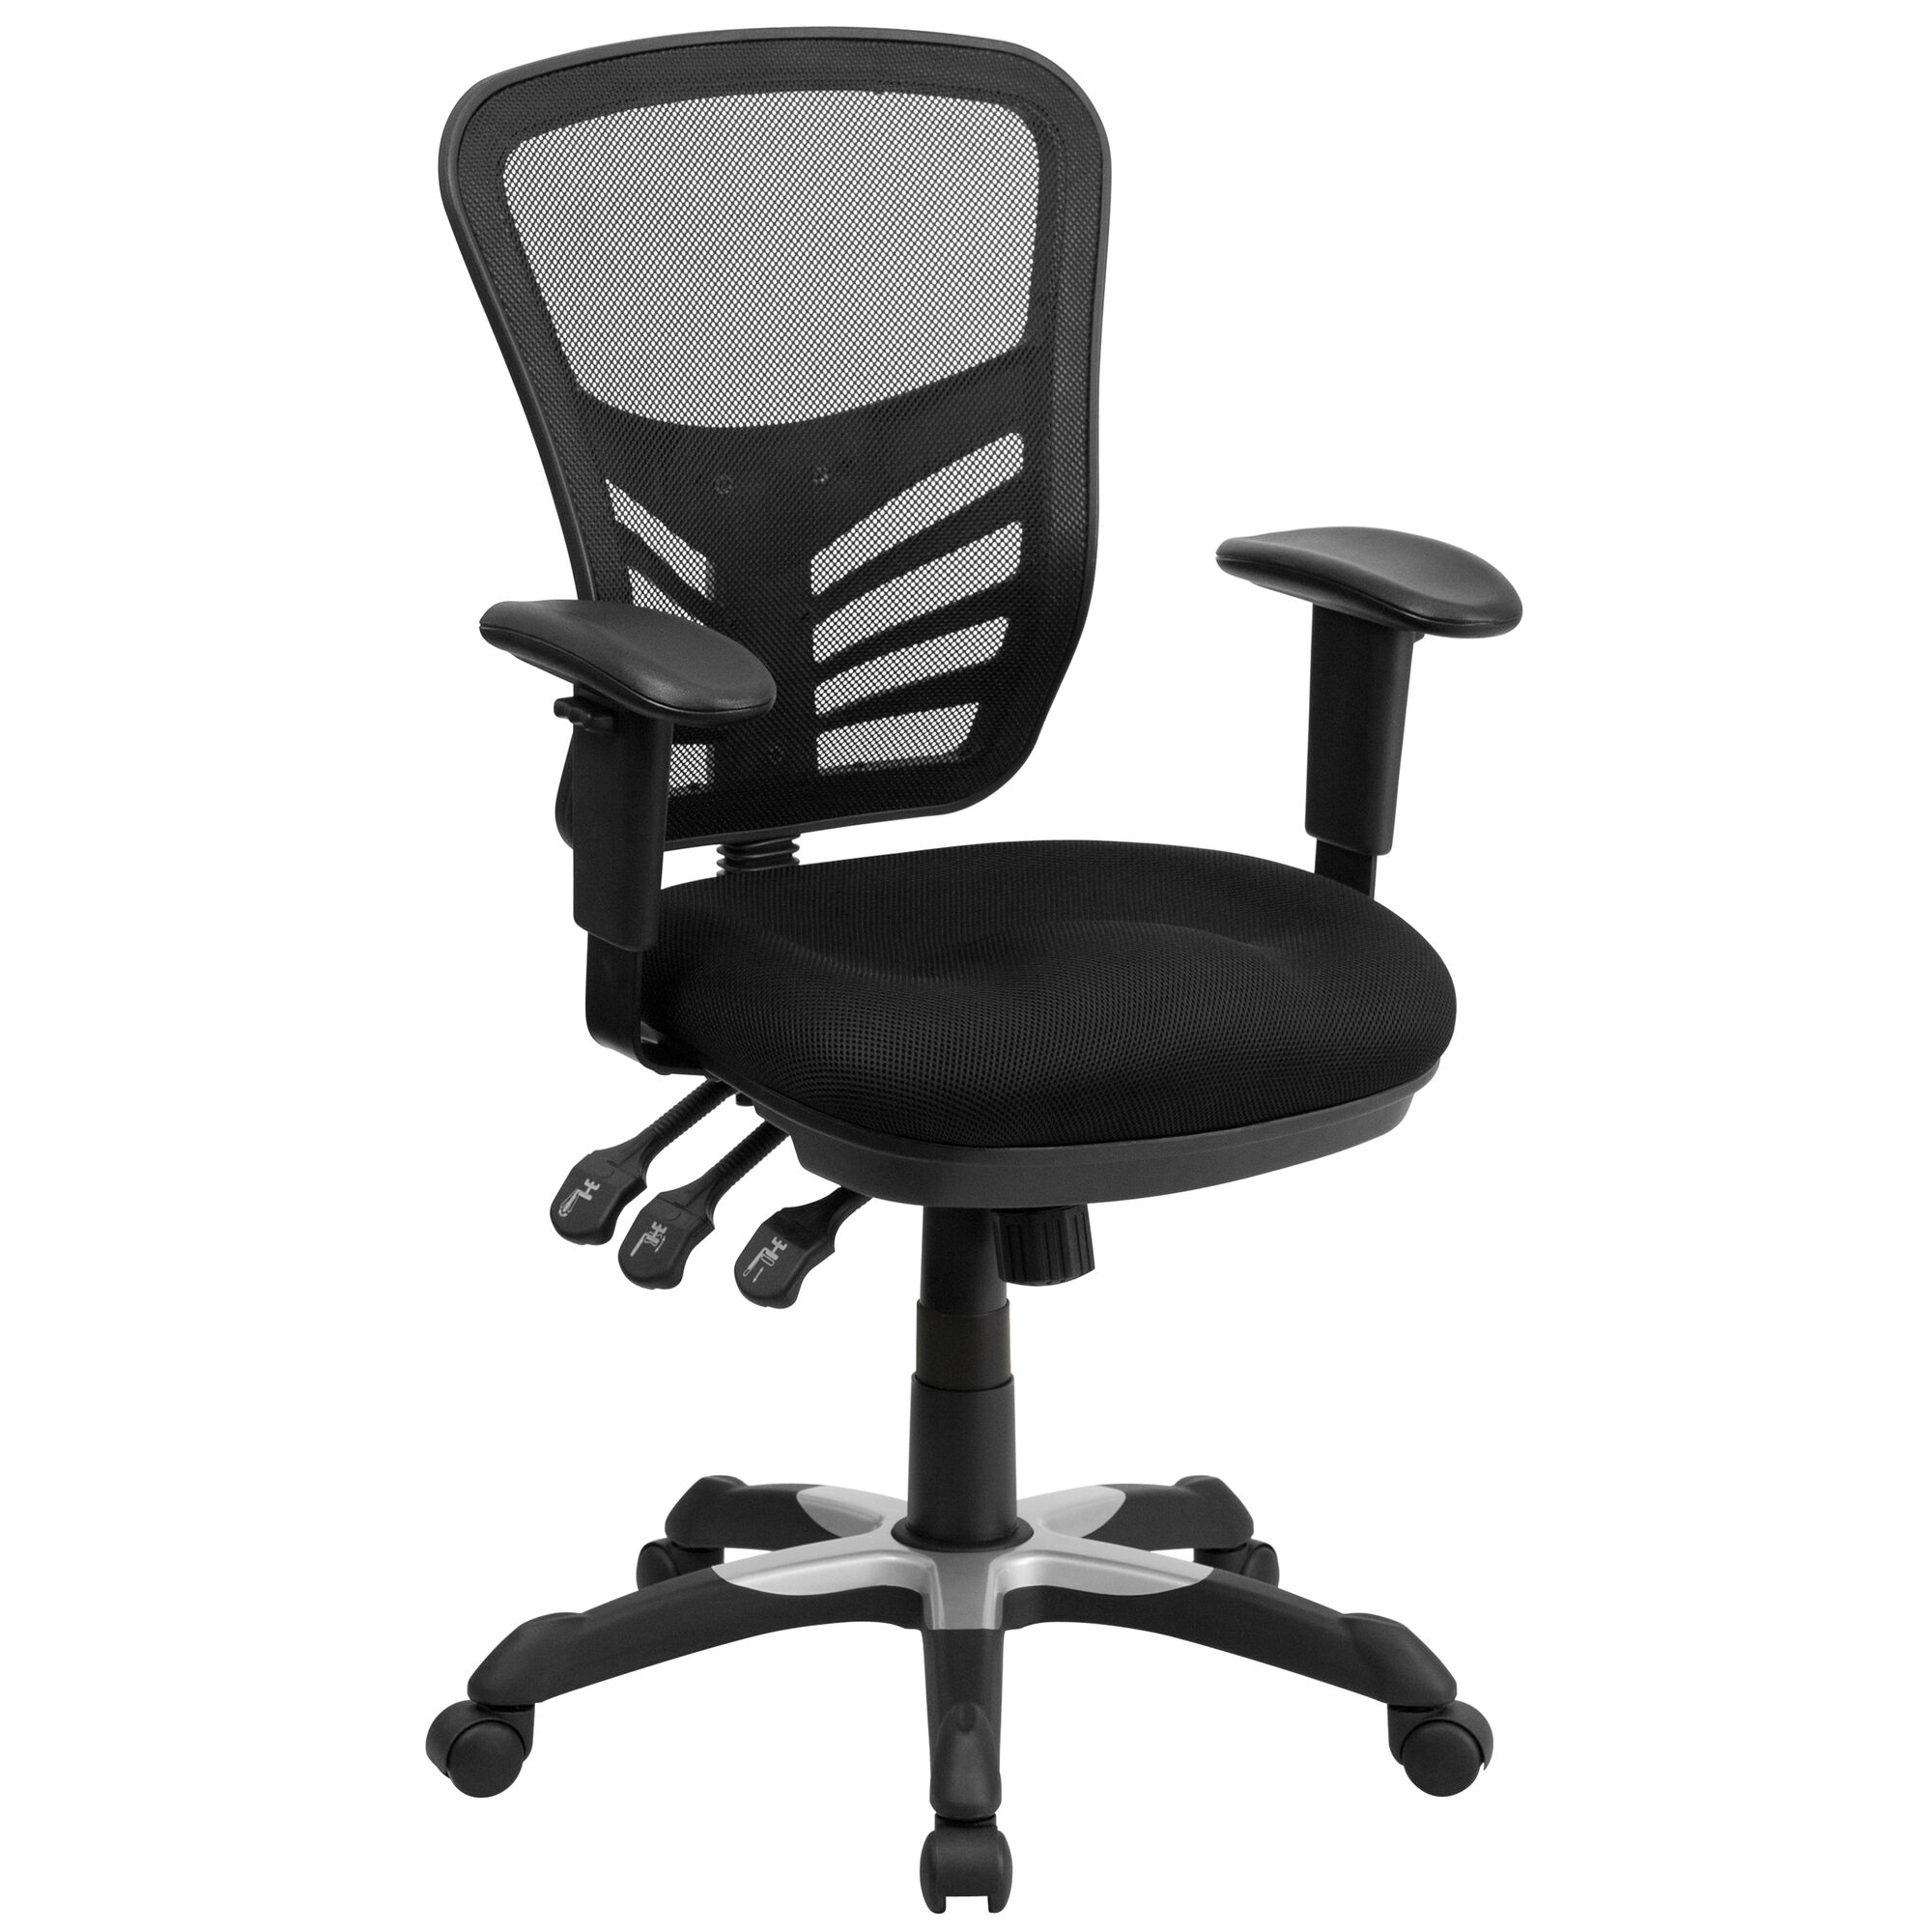 Office-Chairs | Bizchair.com